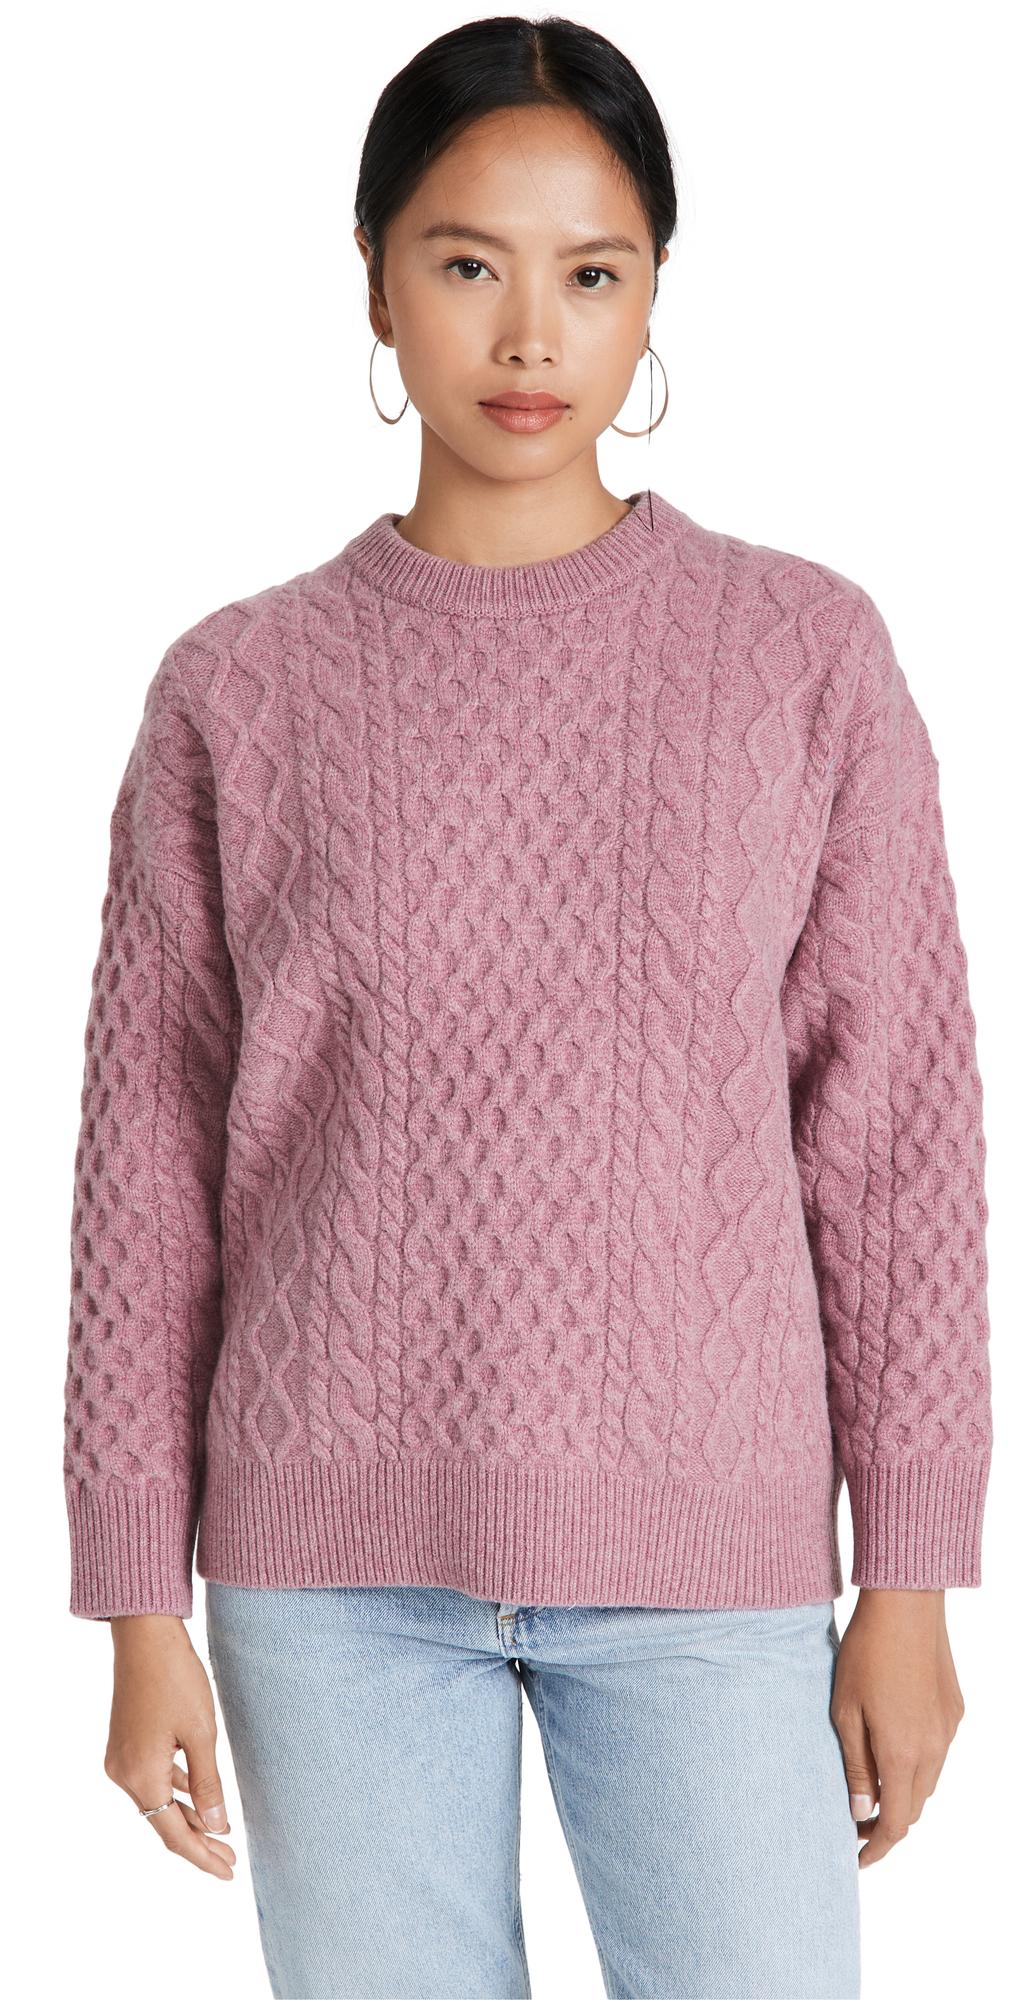 Tasha Sweater